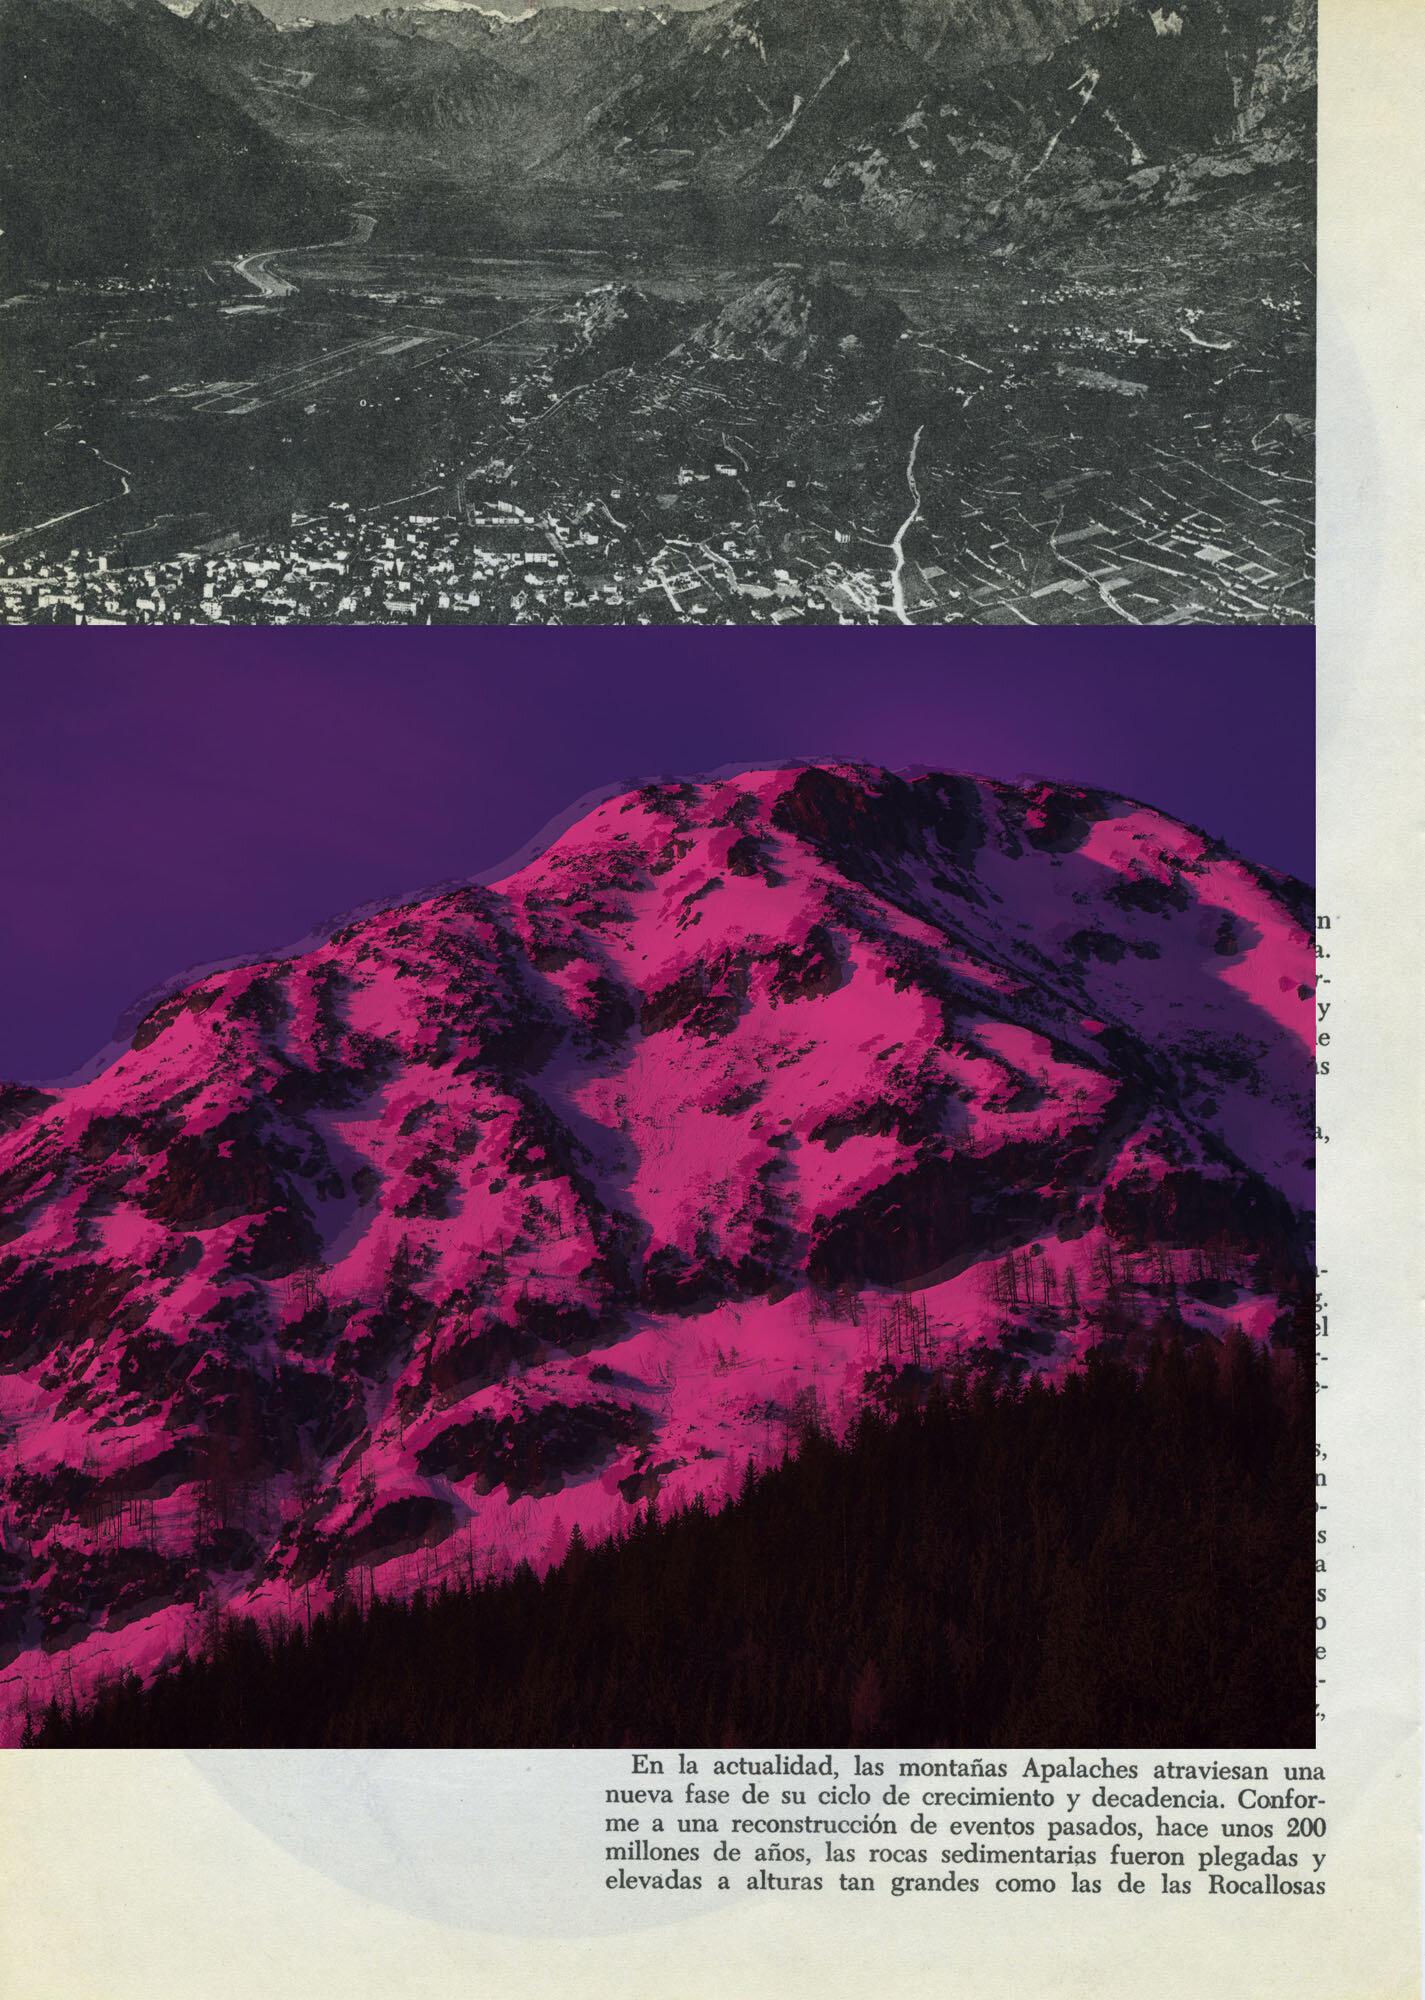 190205 NoA MountainFormation 2.jpg